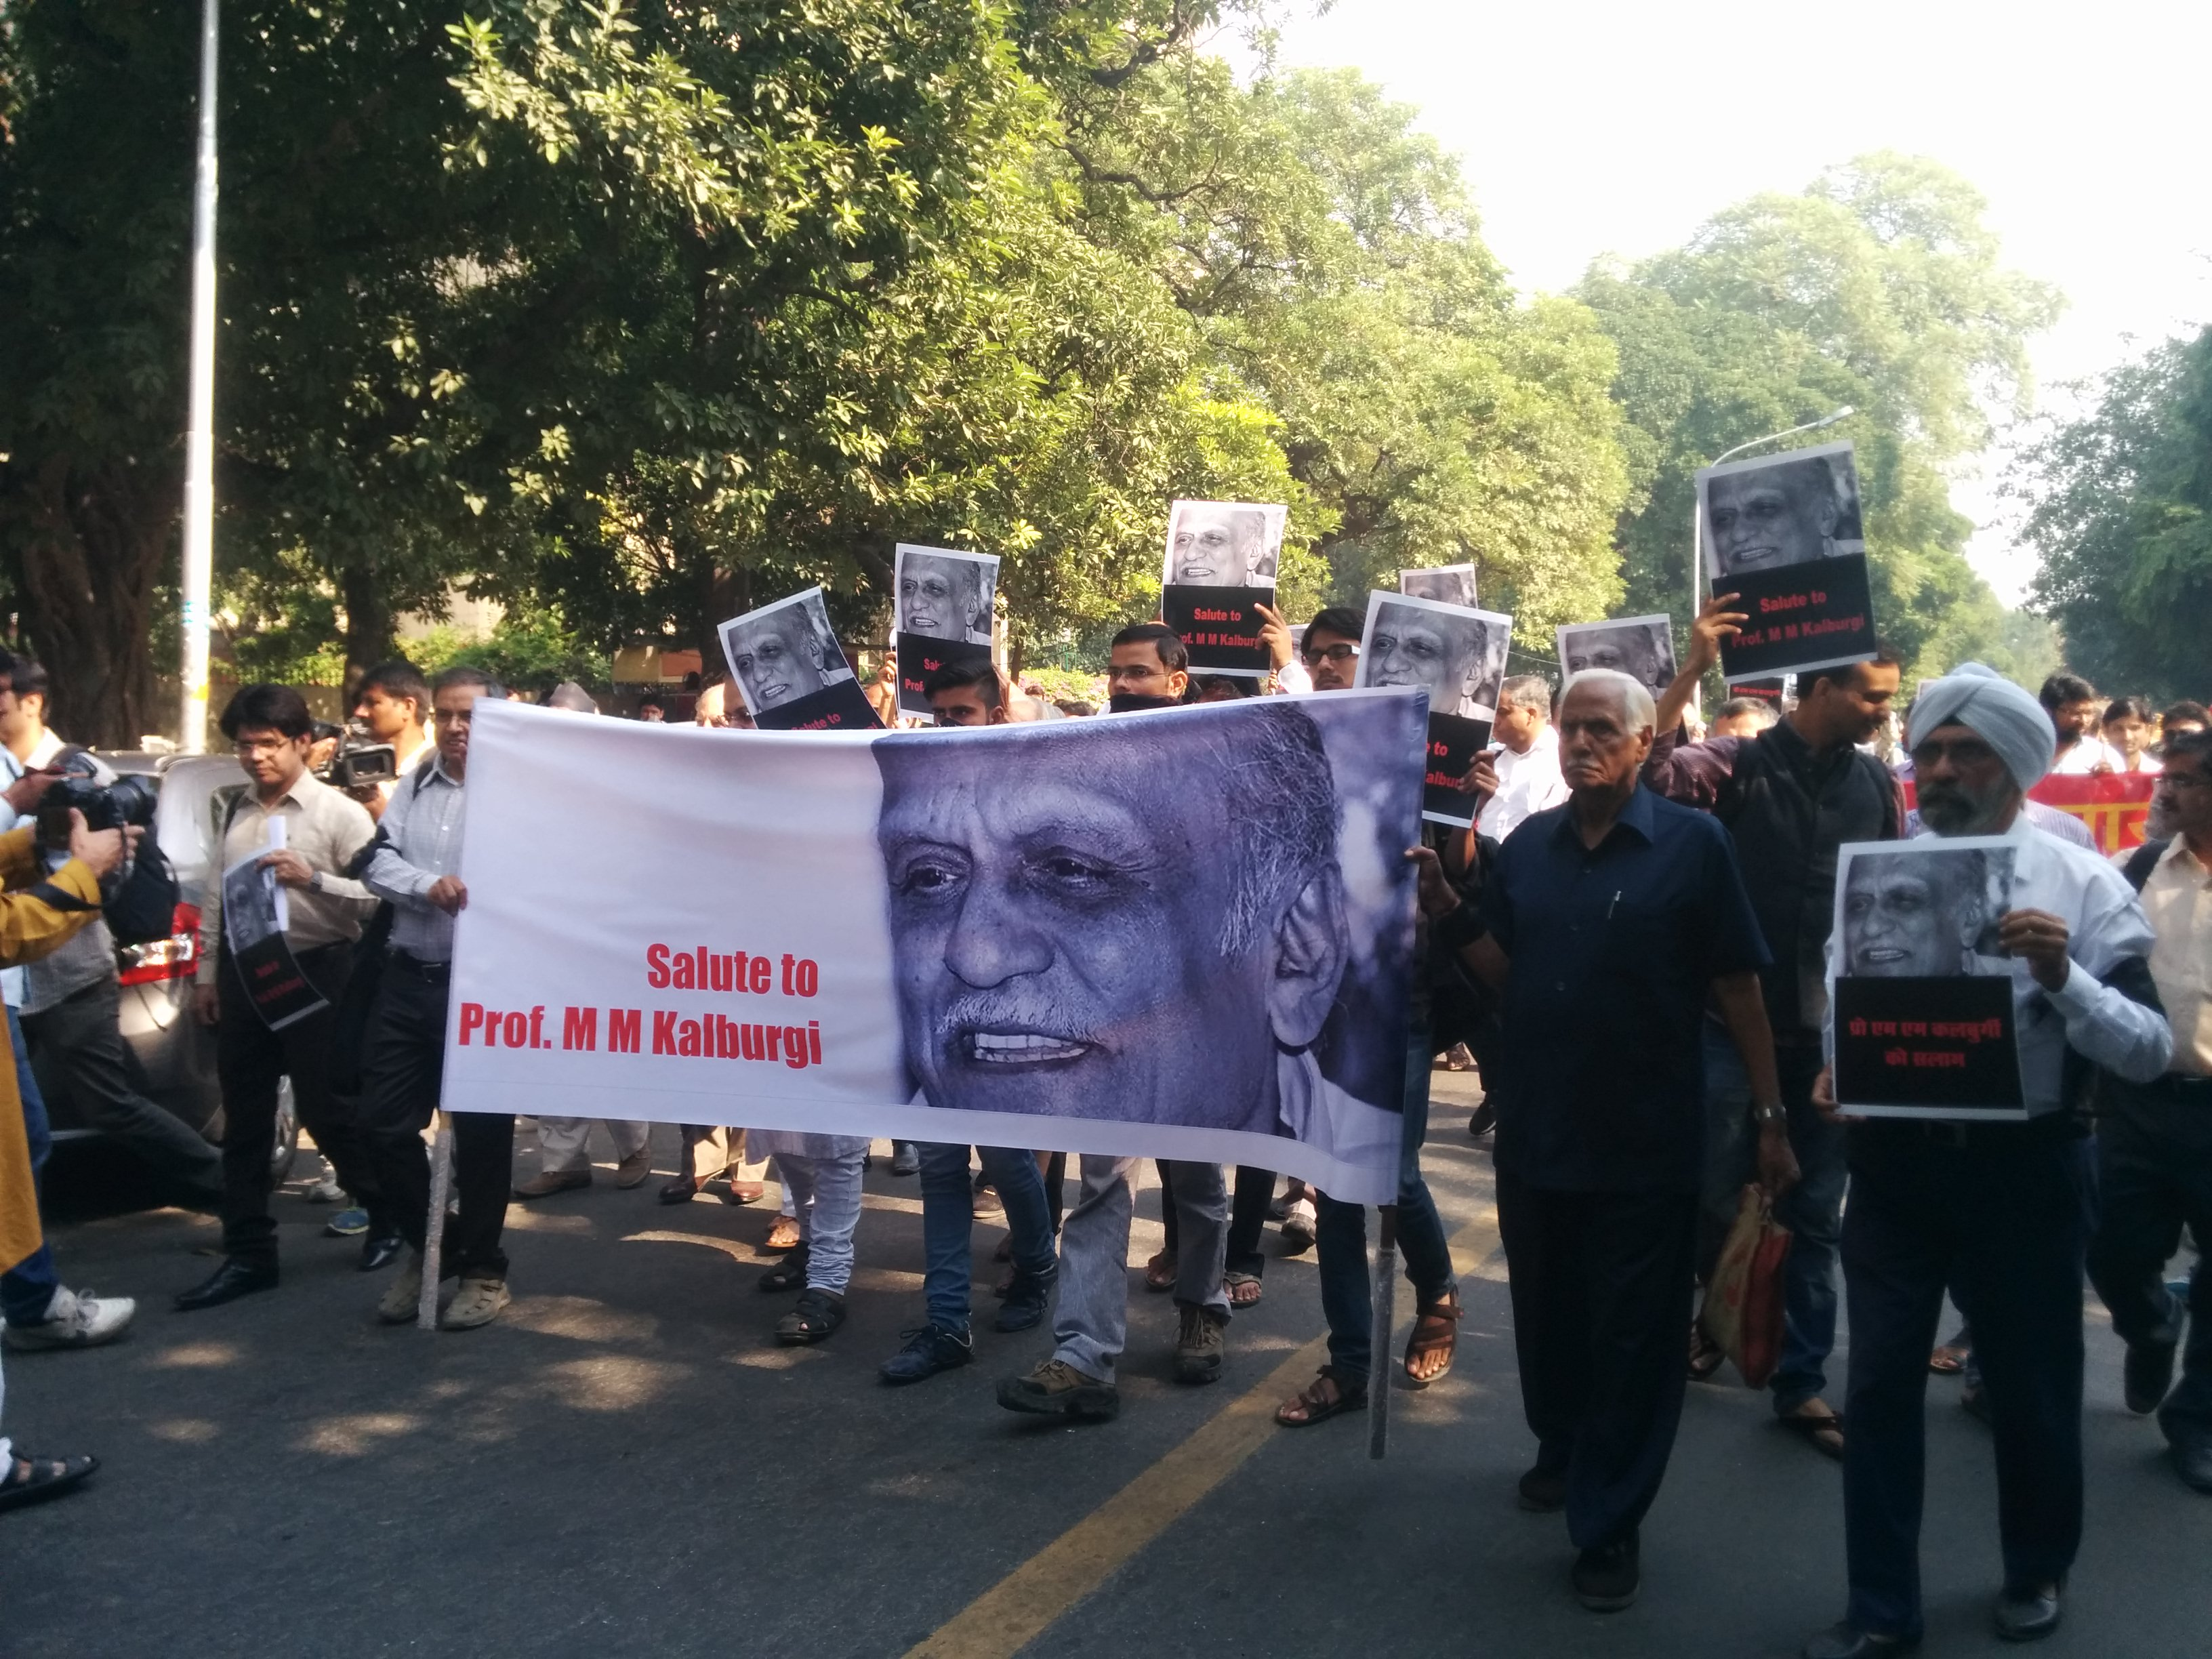 Kalburgi's Wife Identifies Suspect Who Shot Him